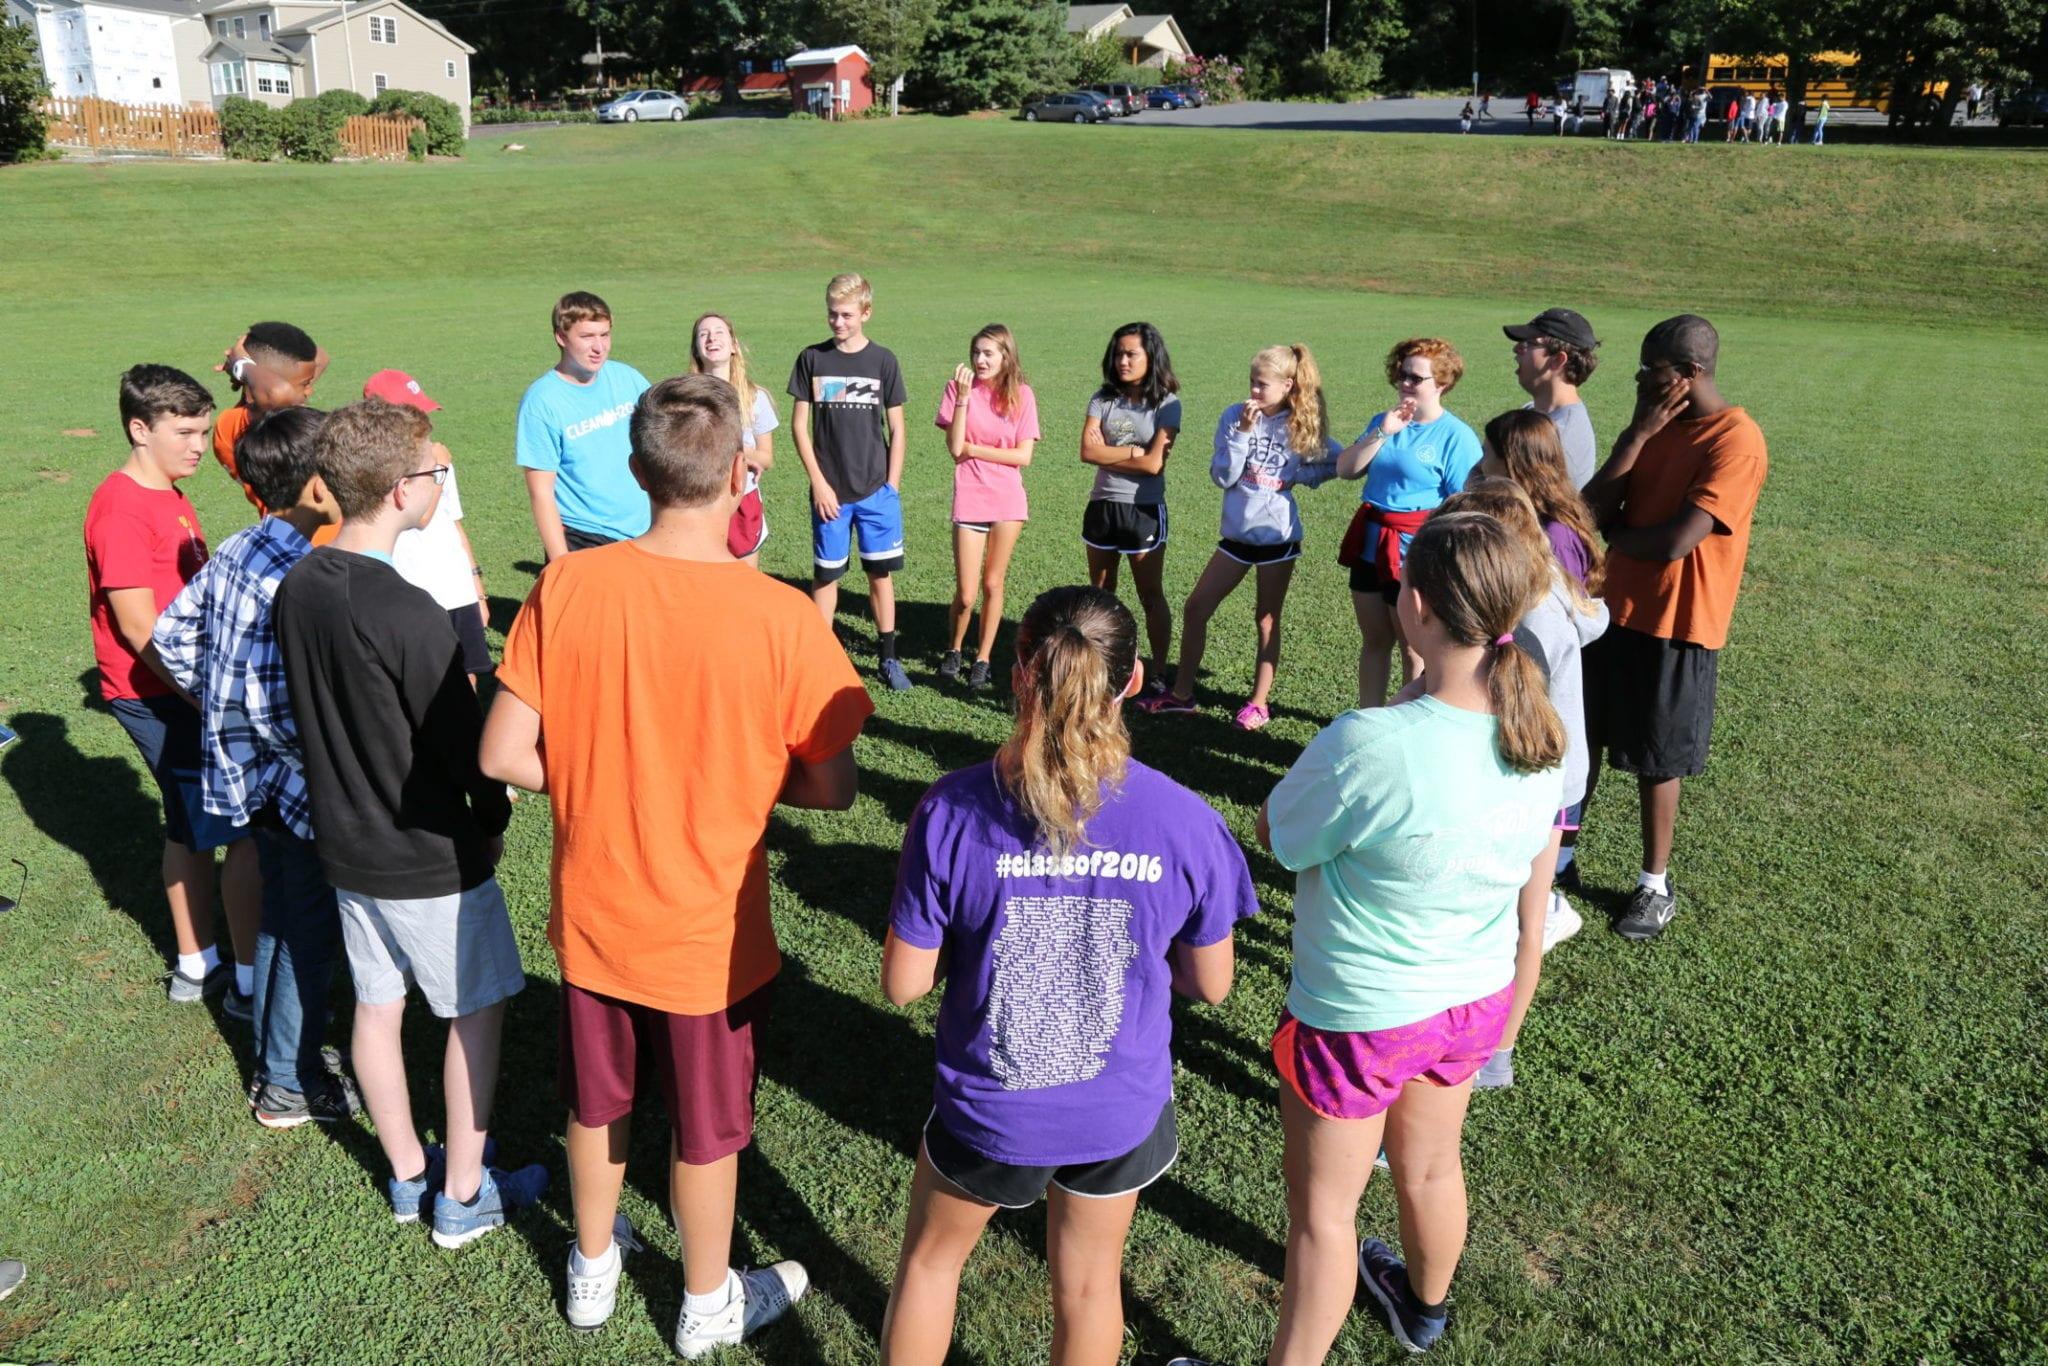 Church Retreat Team Building Activities